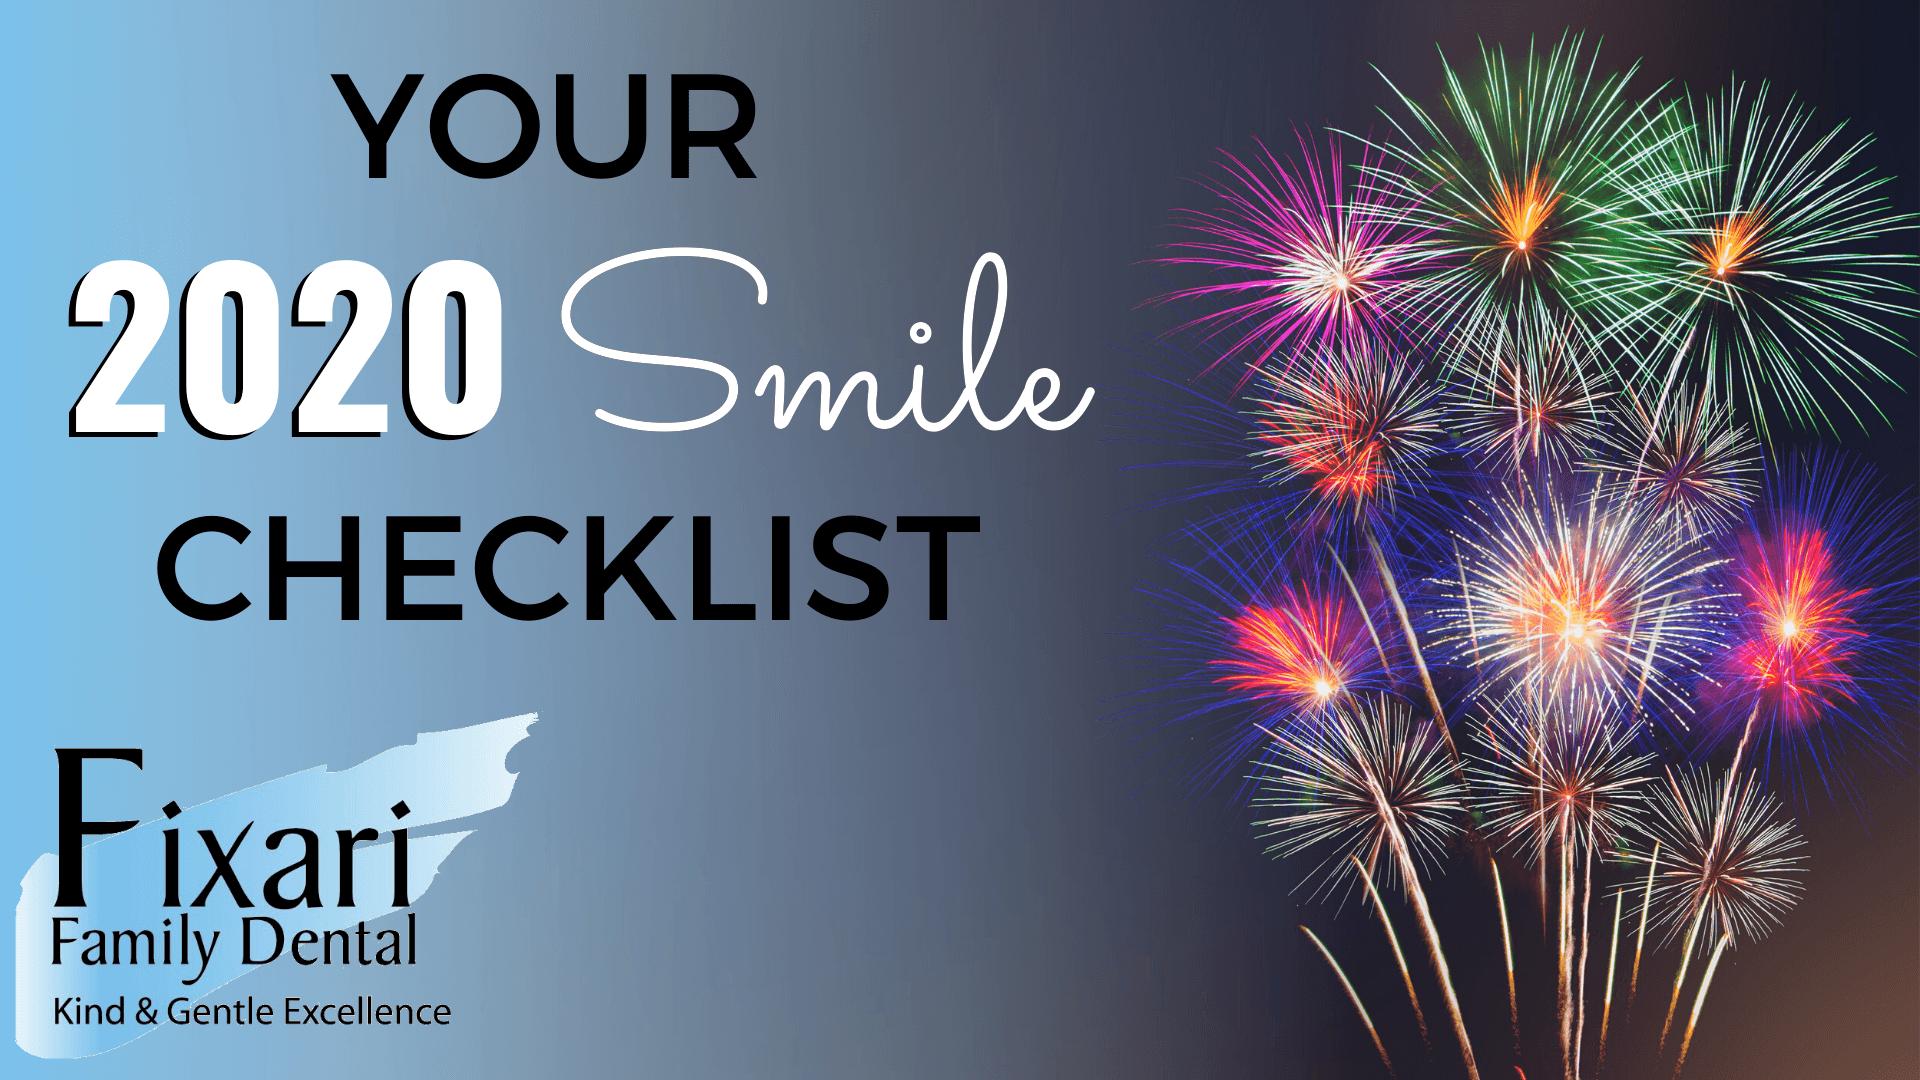 Your 2020 Smile Checklist